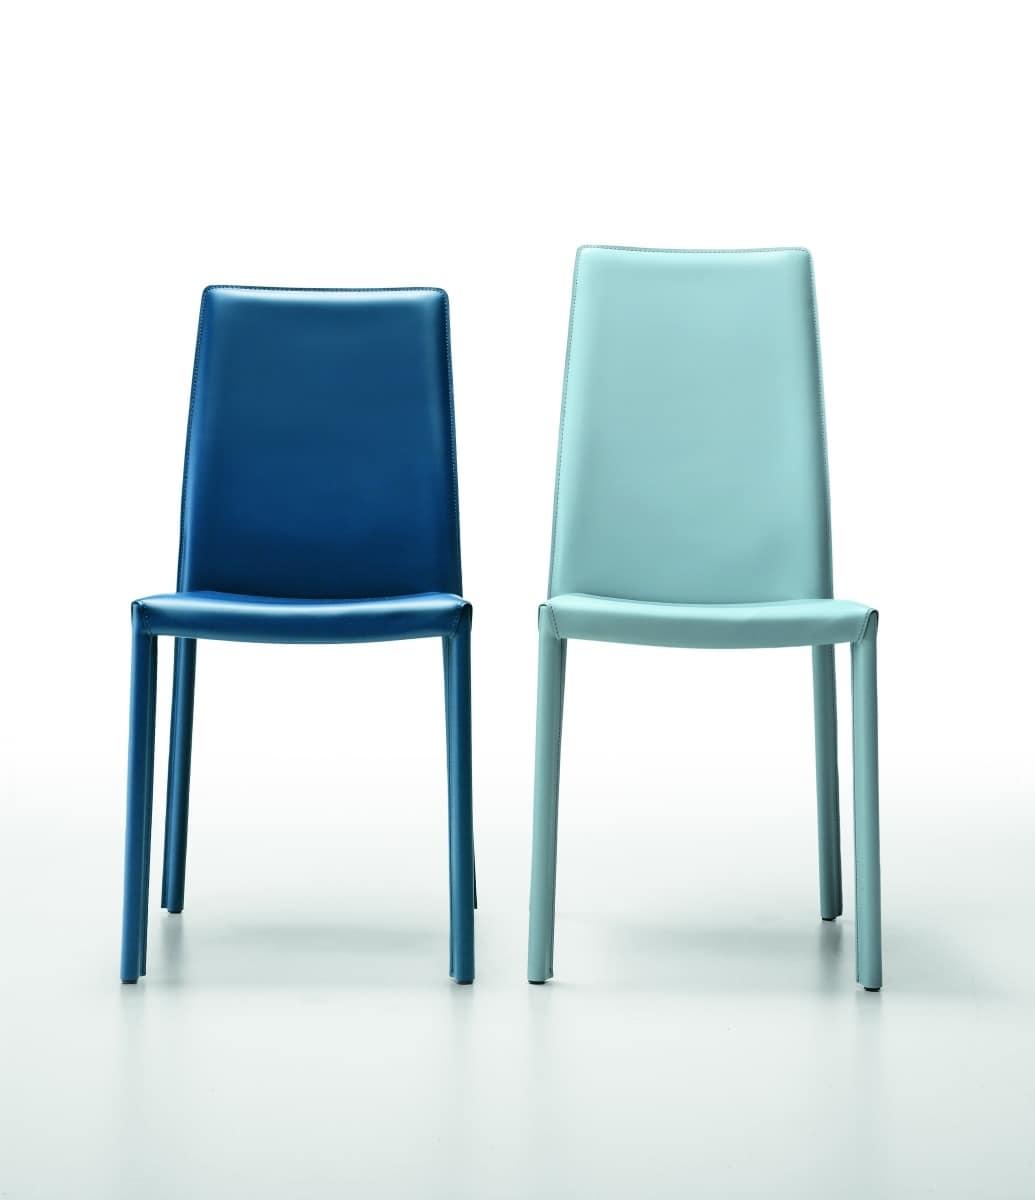 sedia rivestita in pelle con gambe verniciate idfdesign